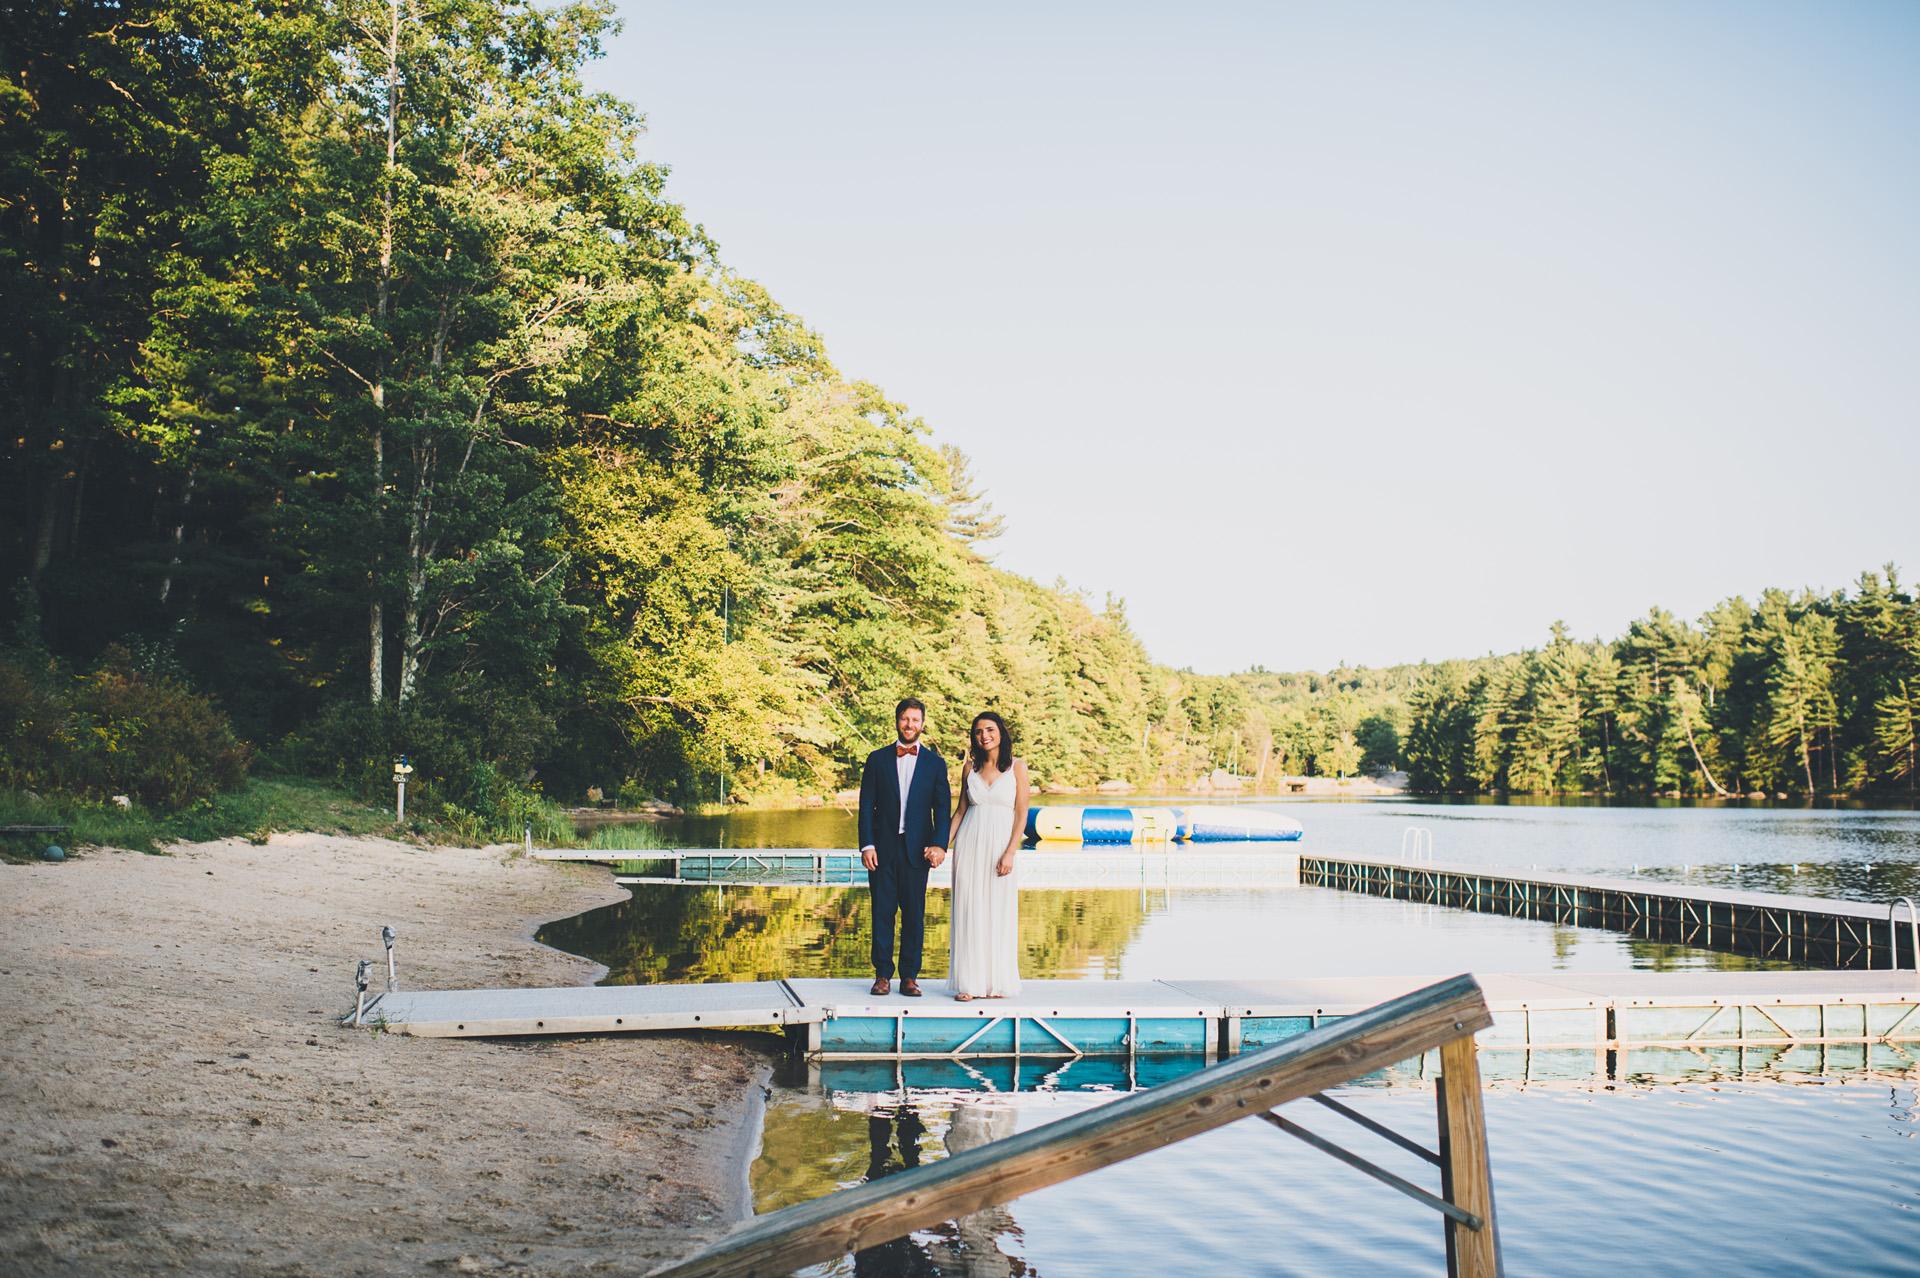 windsor-mountain-summer-camp-wedding-362